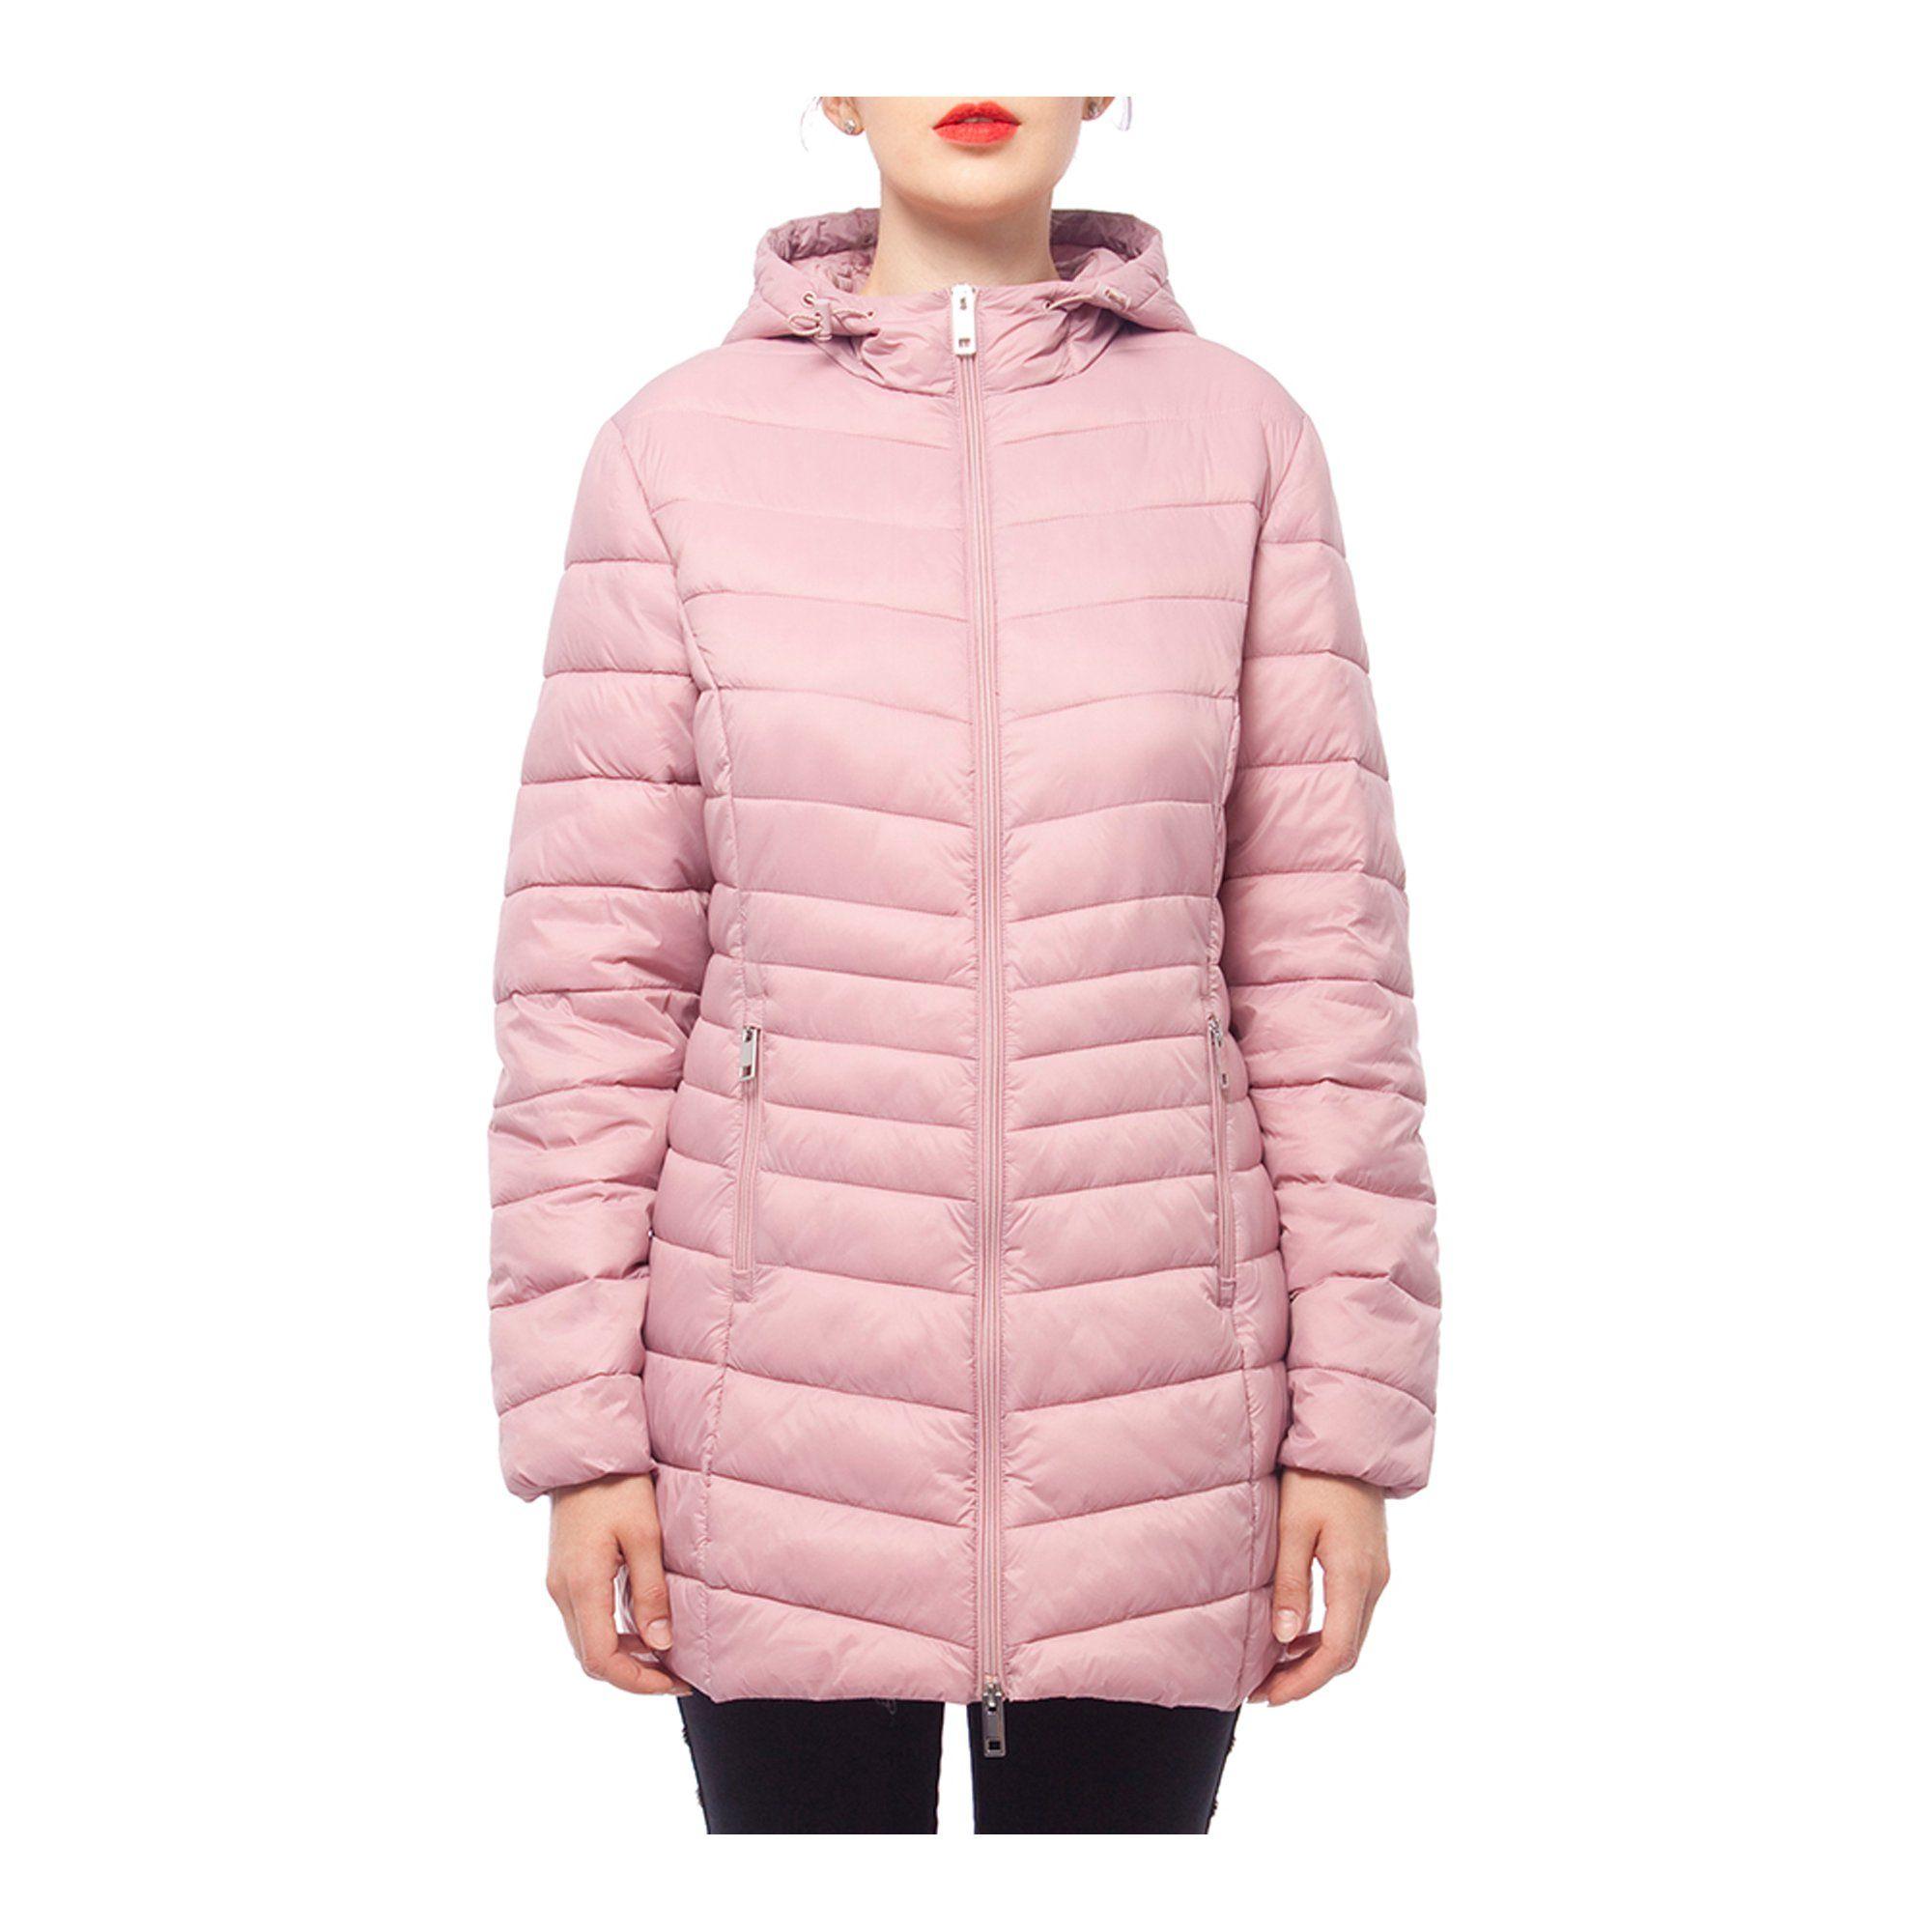 Rokka Rolla Women S Hooded Water Resistant Lightweight Packable Long Coat Puffer Jacket Walmart Com Women S Puffer Coats Puffer Coat With Hood Women S Puffer [ 2000 x 2000 Pixel ]